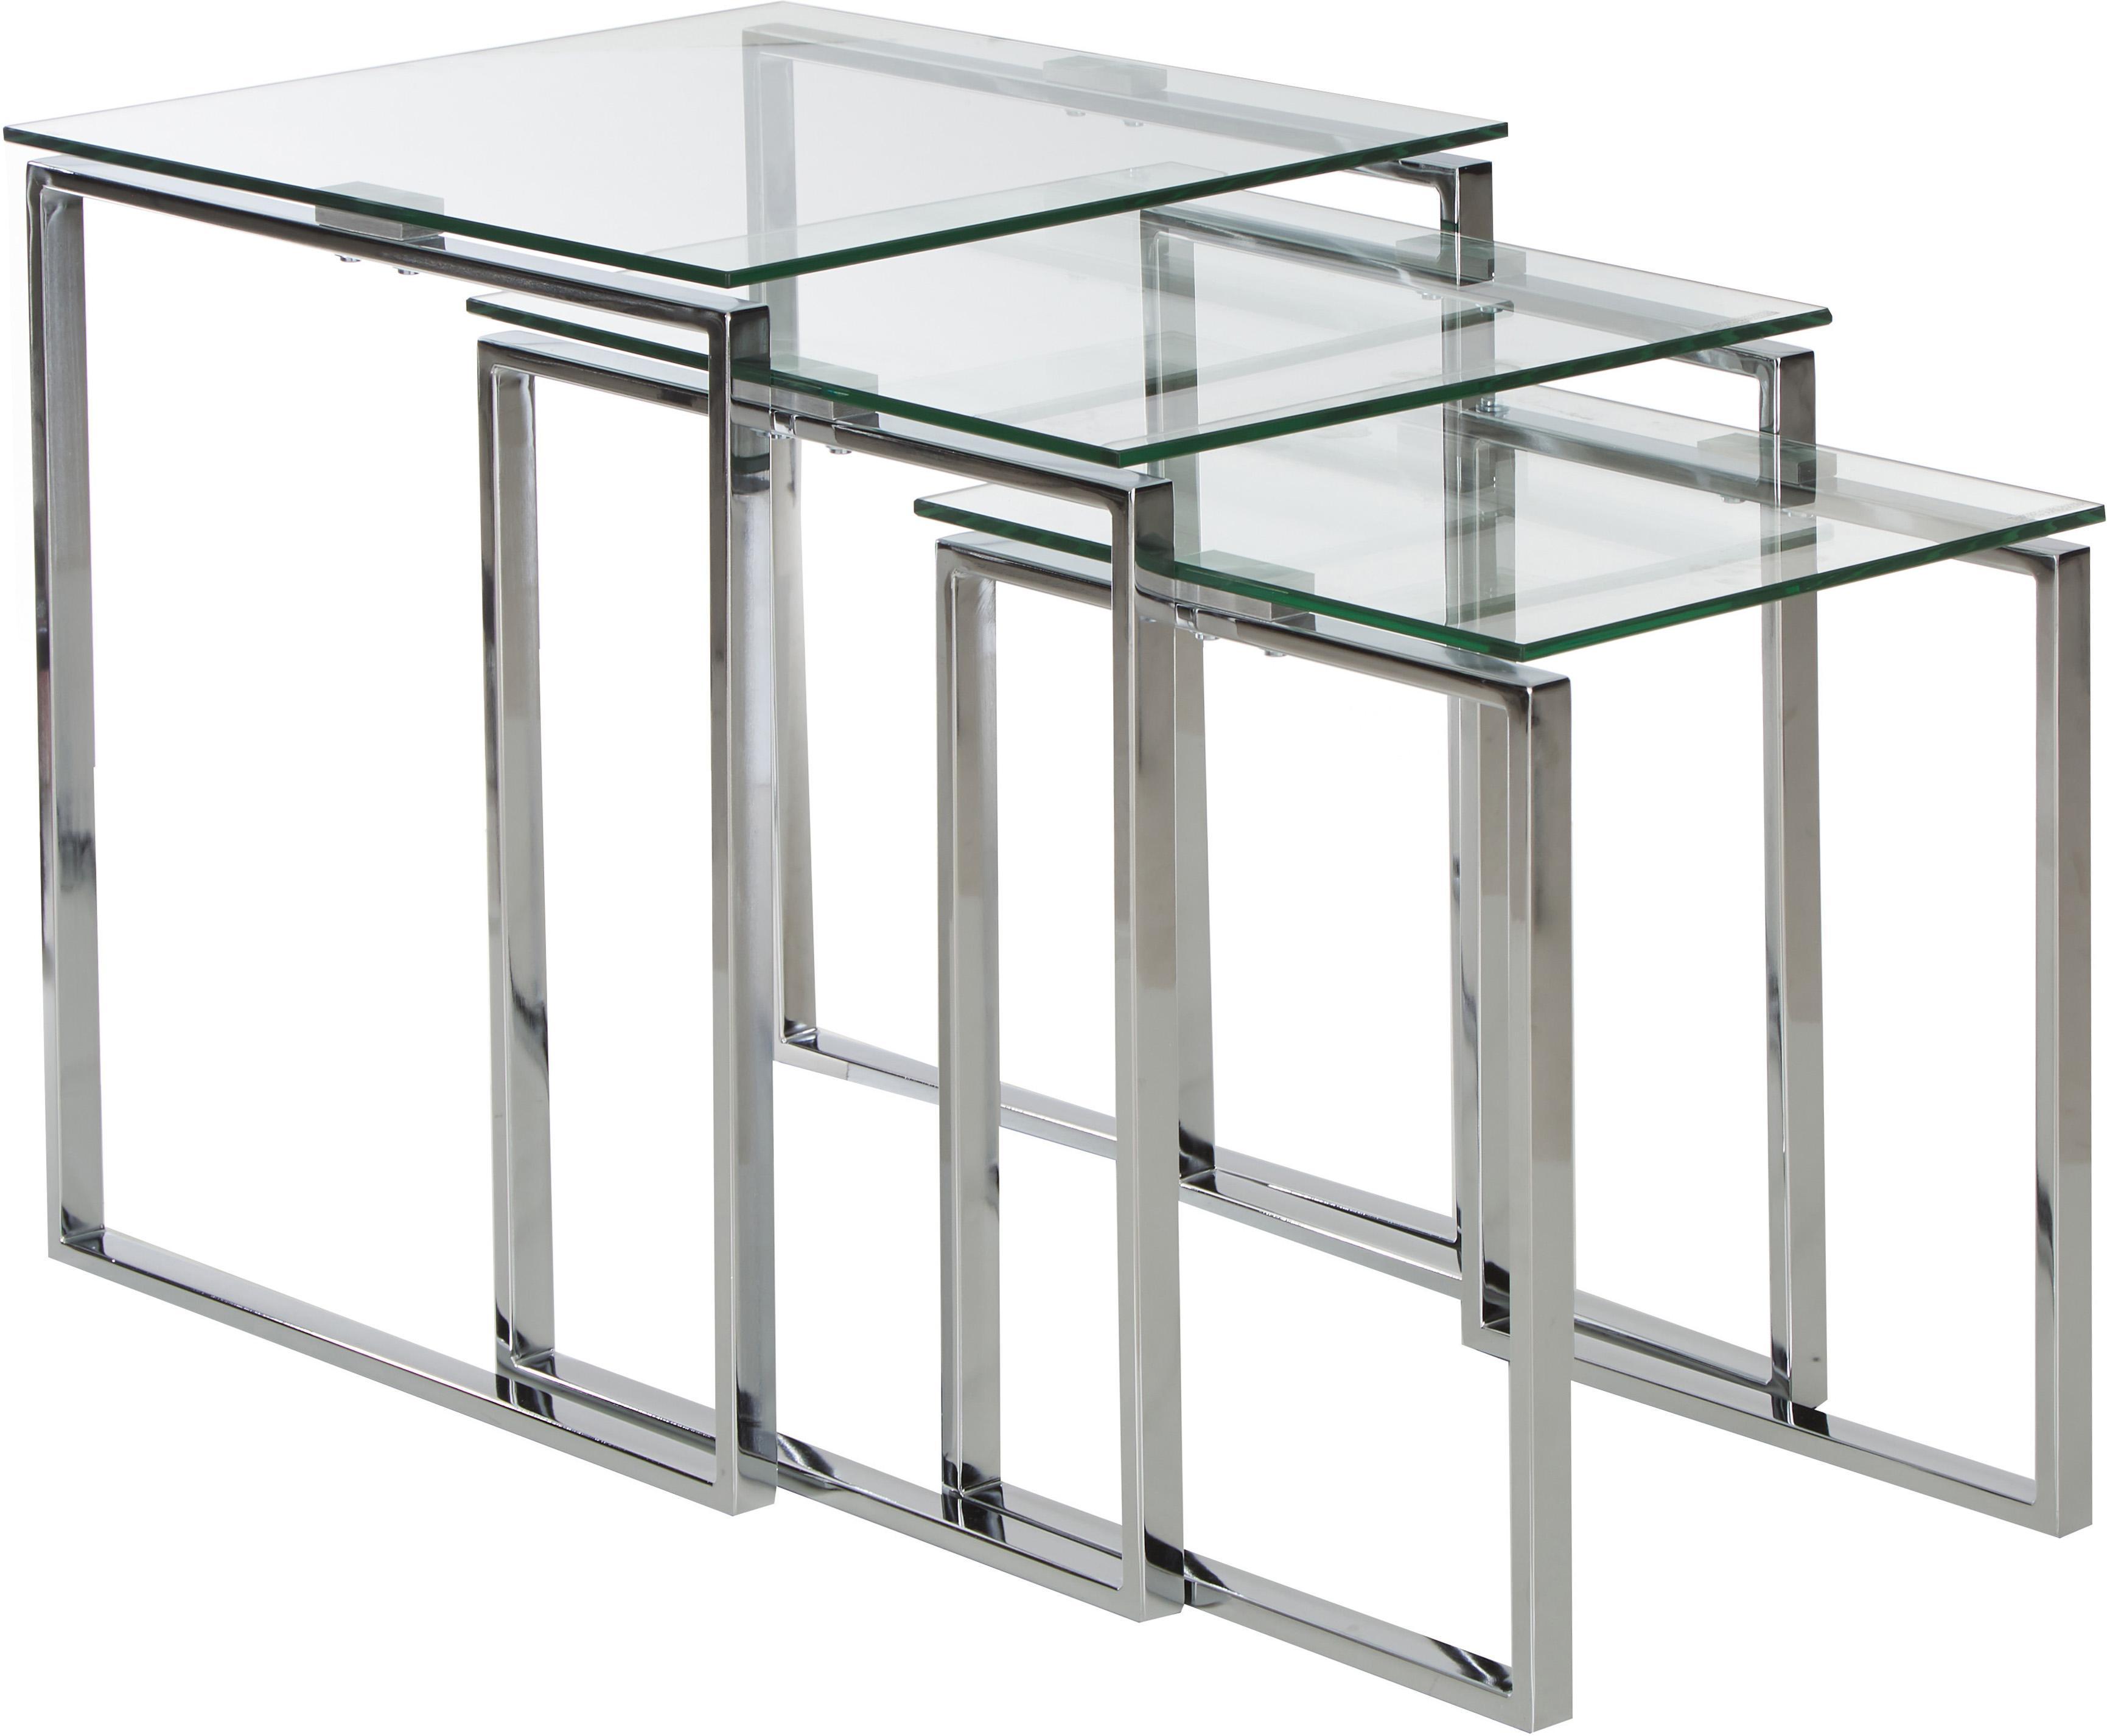 Bijzettafelset Katrine, 3-delig, Frame: verchroomd staal, Tafelblad: veiligheidsglas, Chroomkleurig, transparant, Set met verschillende formaten